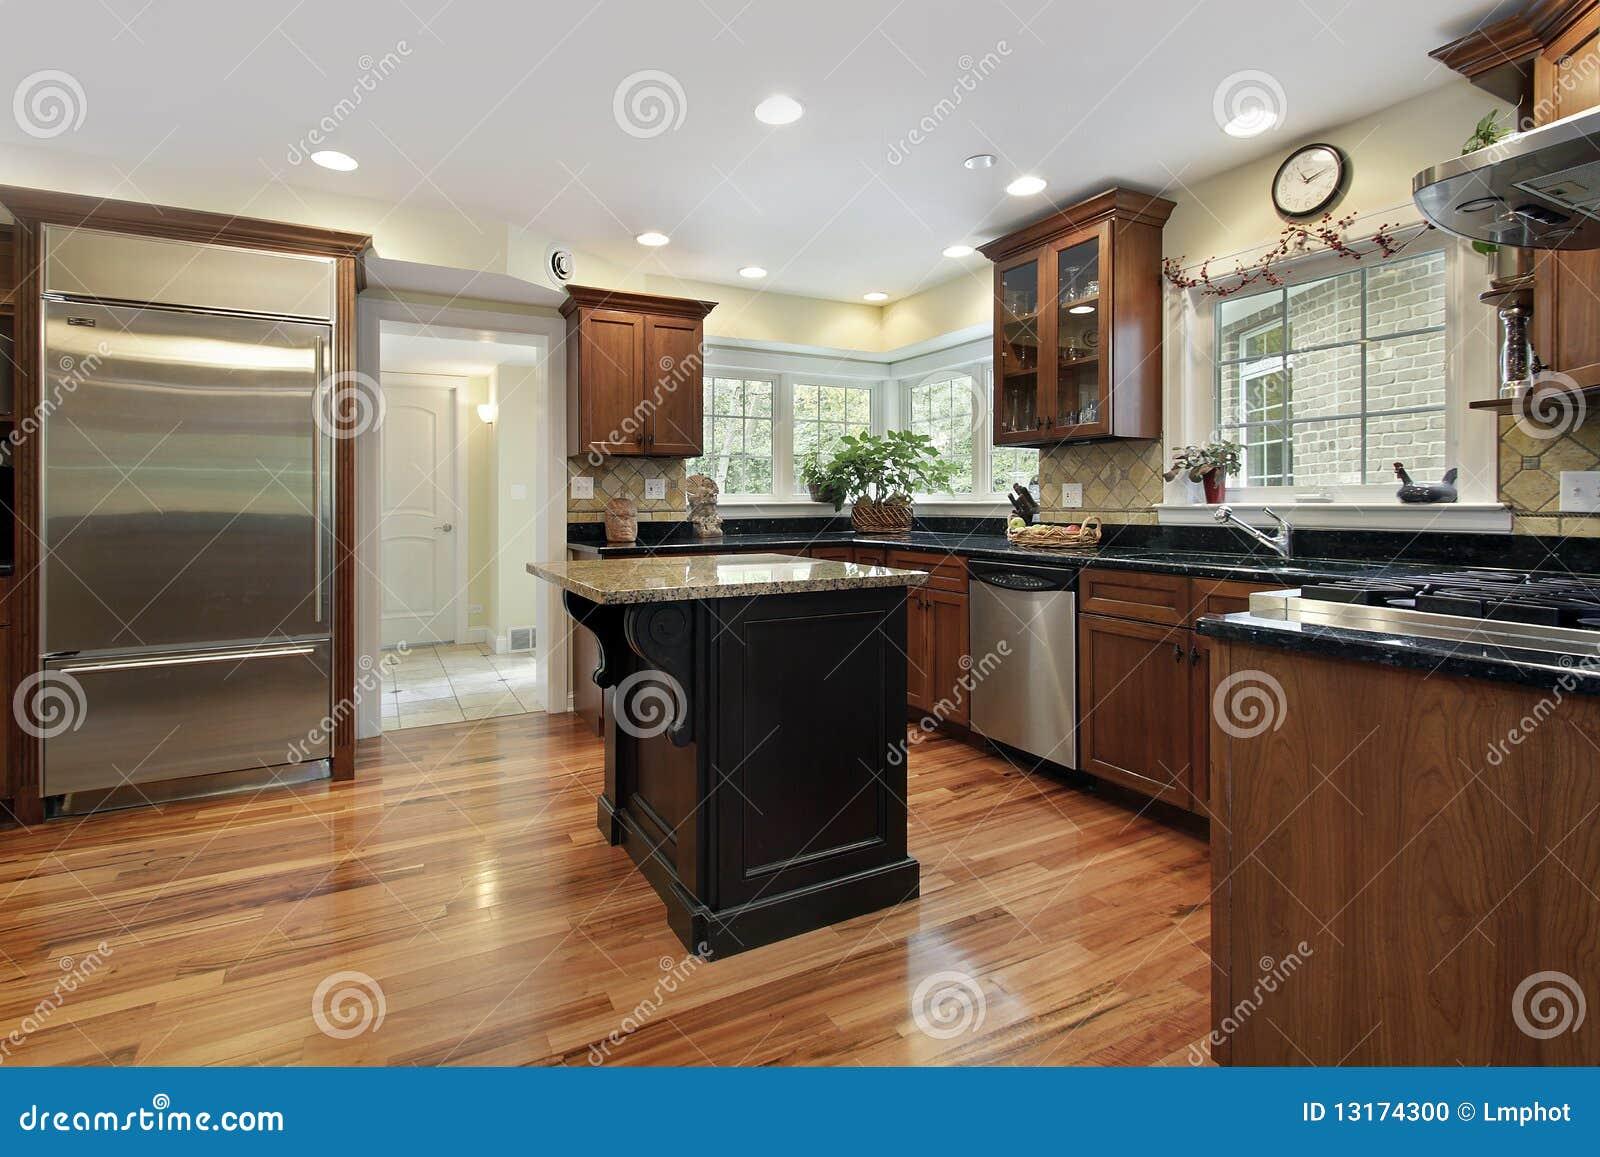 Kitchen Granite Island Kitchen With Black And Granite Island Stock Photo Image 13174300